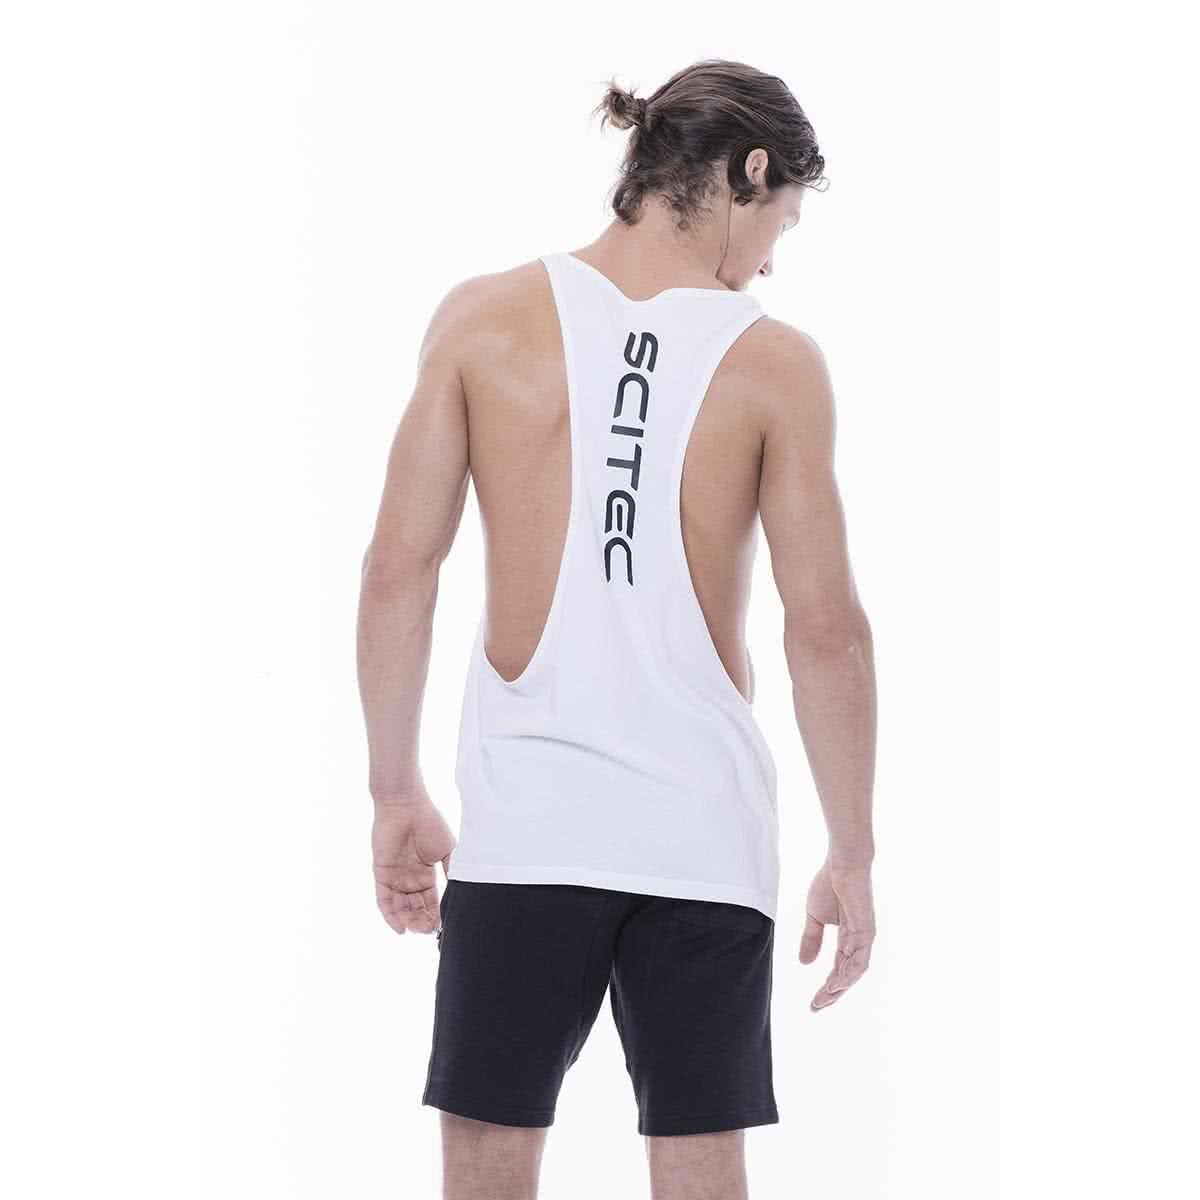 Scitec Nutrition Andorra férfi edző trikó